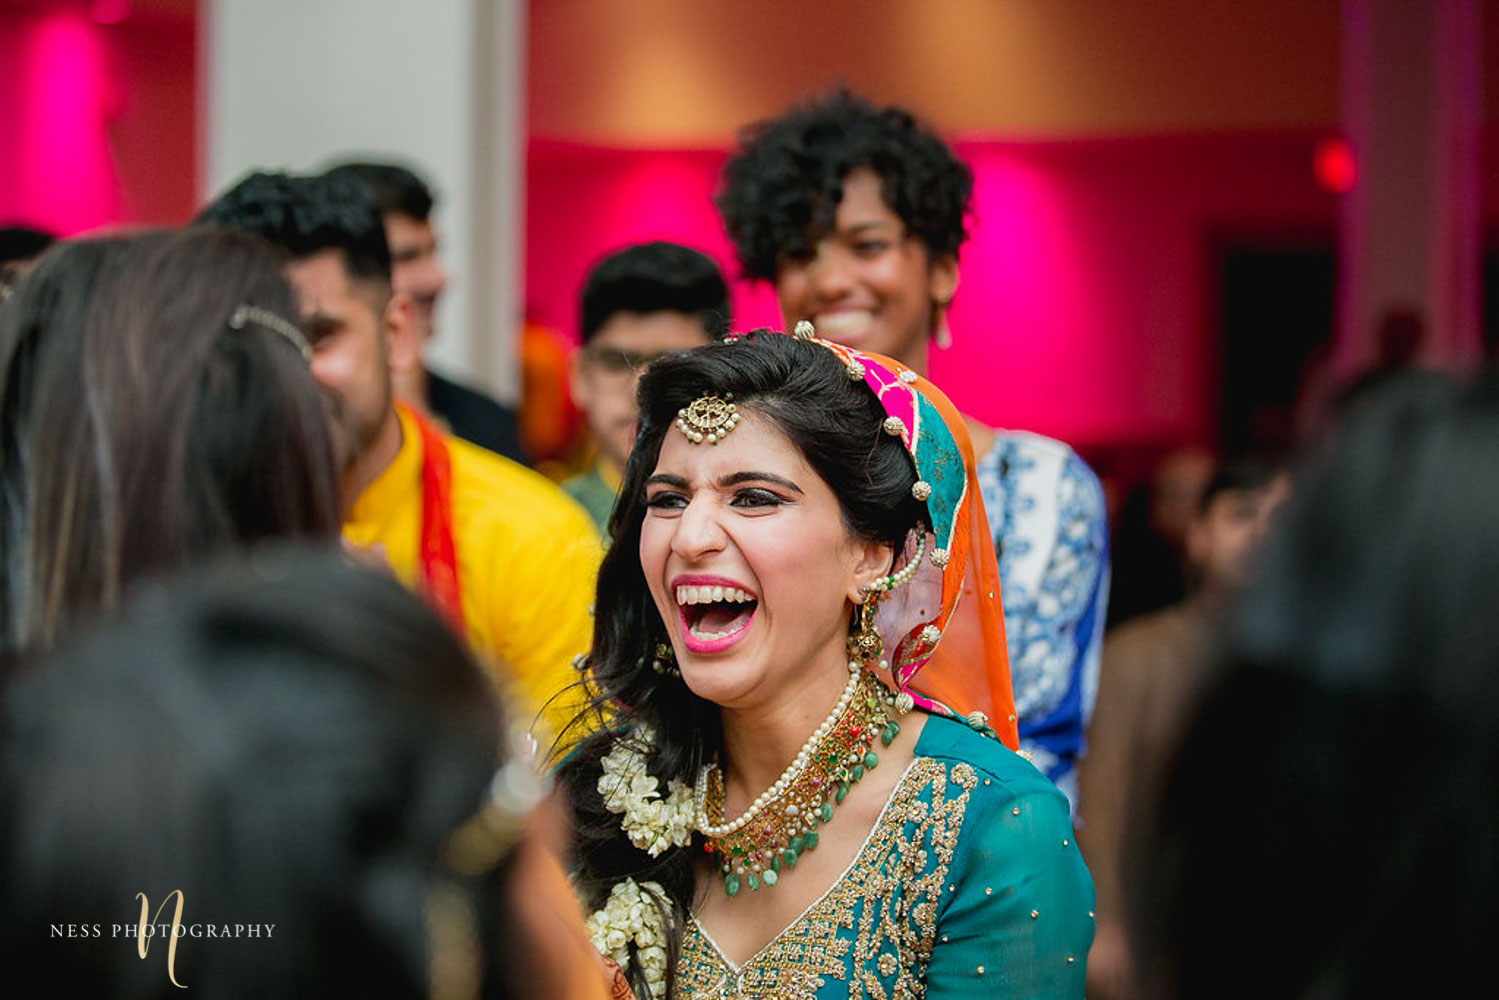 bride in bleu lehenga dancing and laughing at mehendi in ottawa